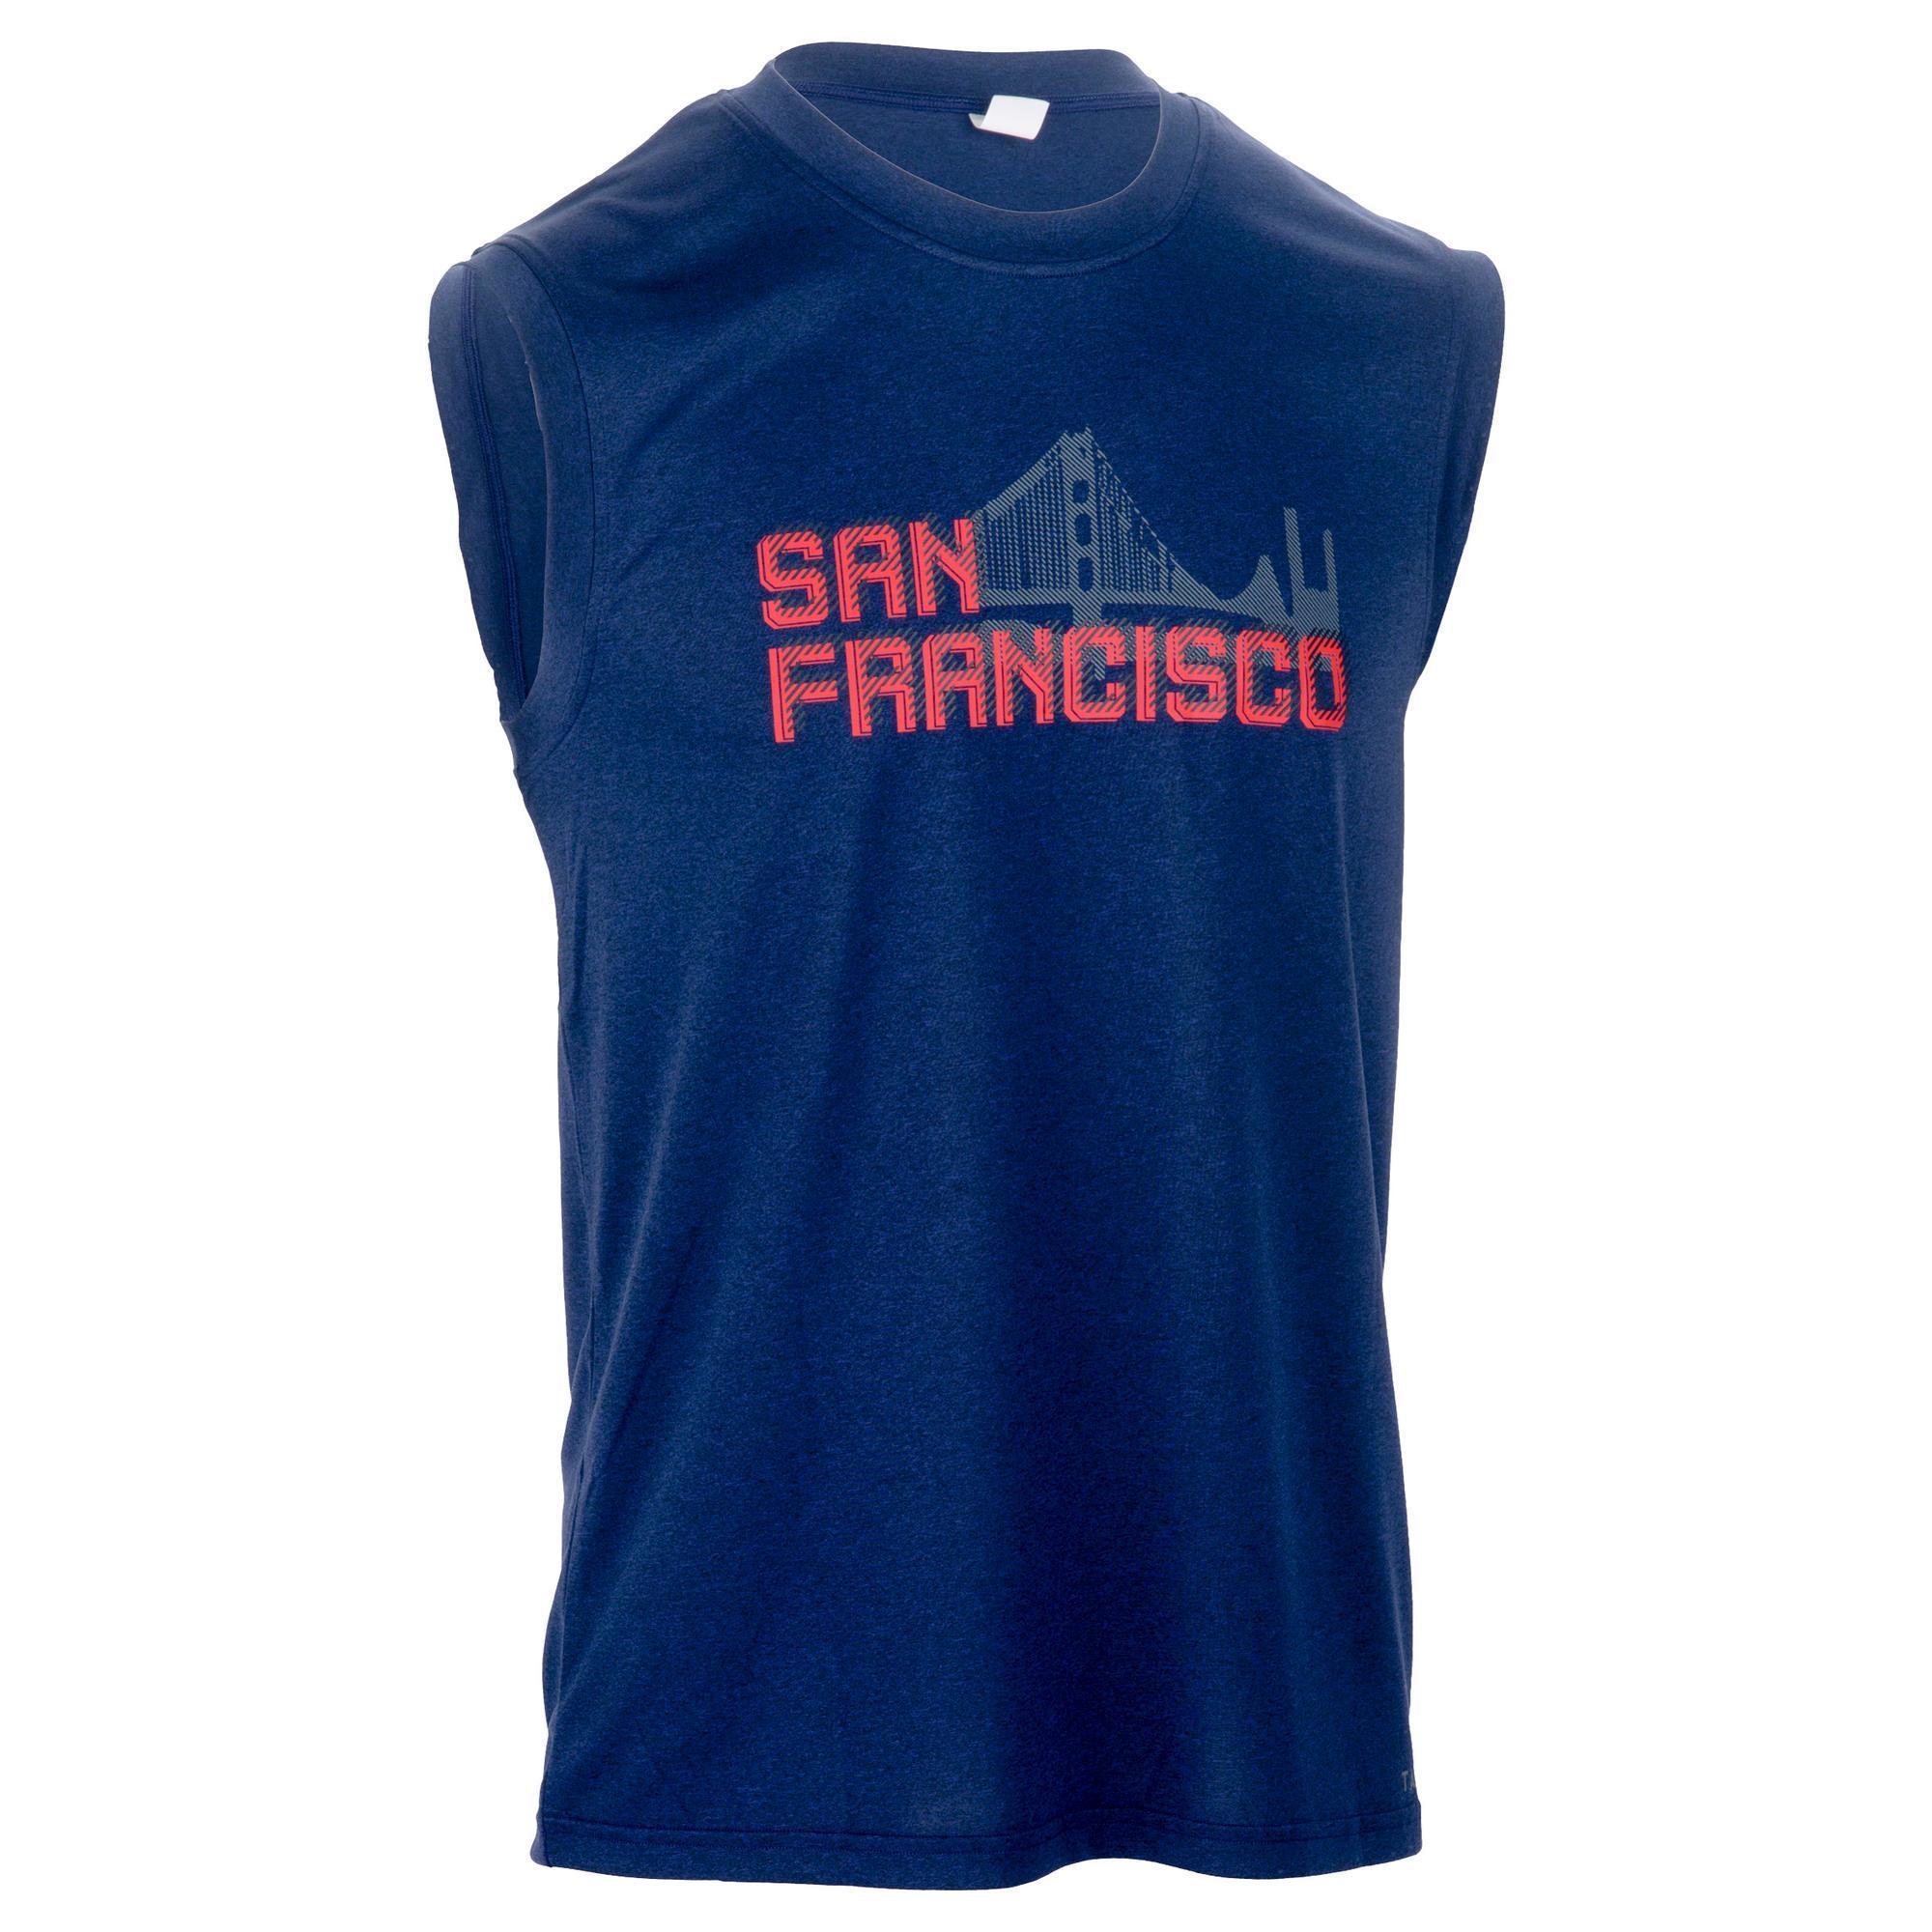 Tarmak Basketbalshirt Fast San Francisco